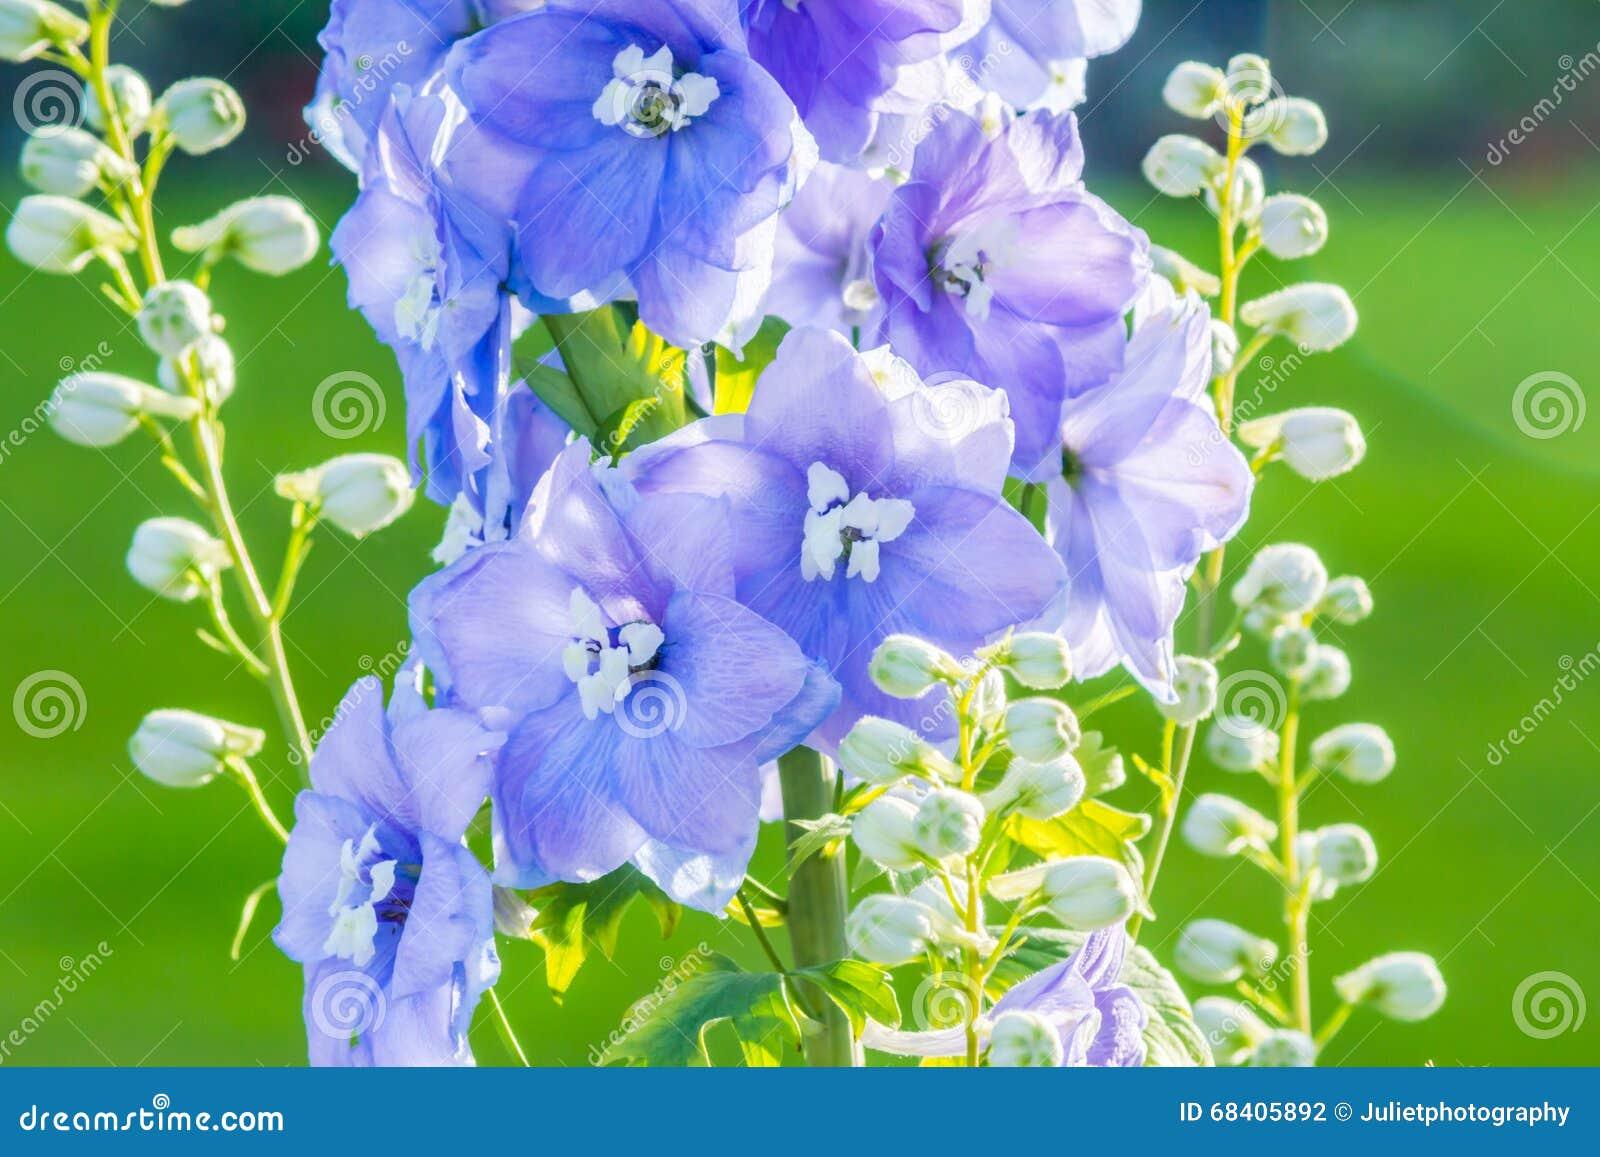 Delphinium after midnight close up of abundant blue flowers on a download delphinium after midnight close up of abundant blue flowers on a single izmirmasajfo